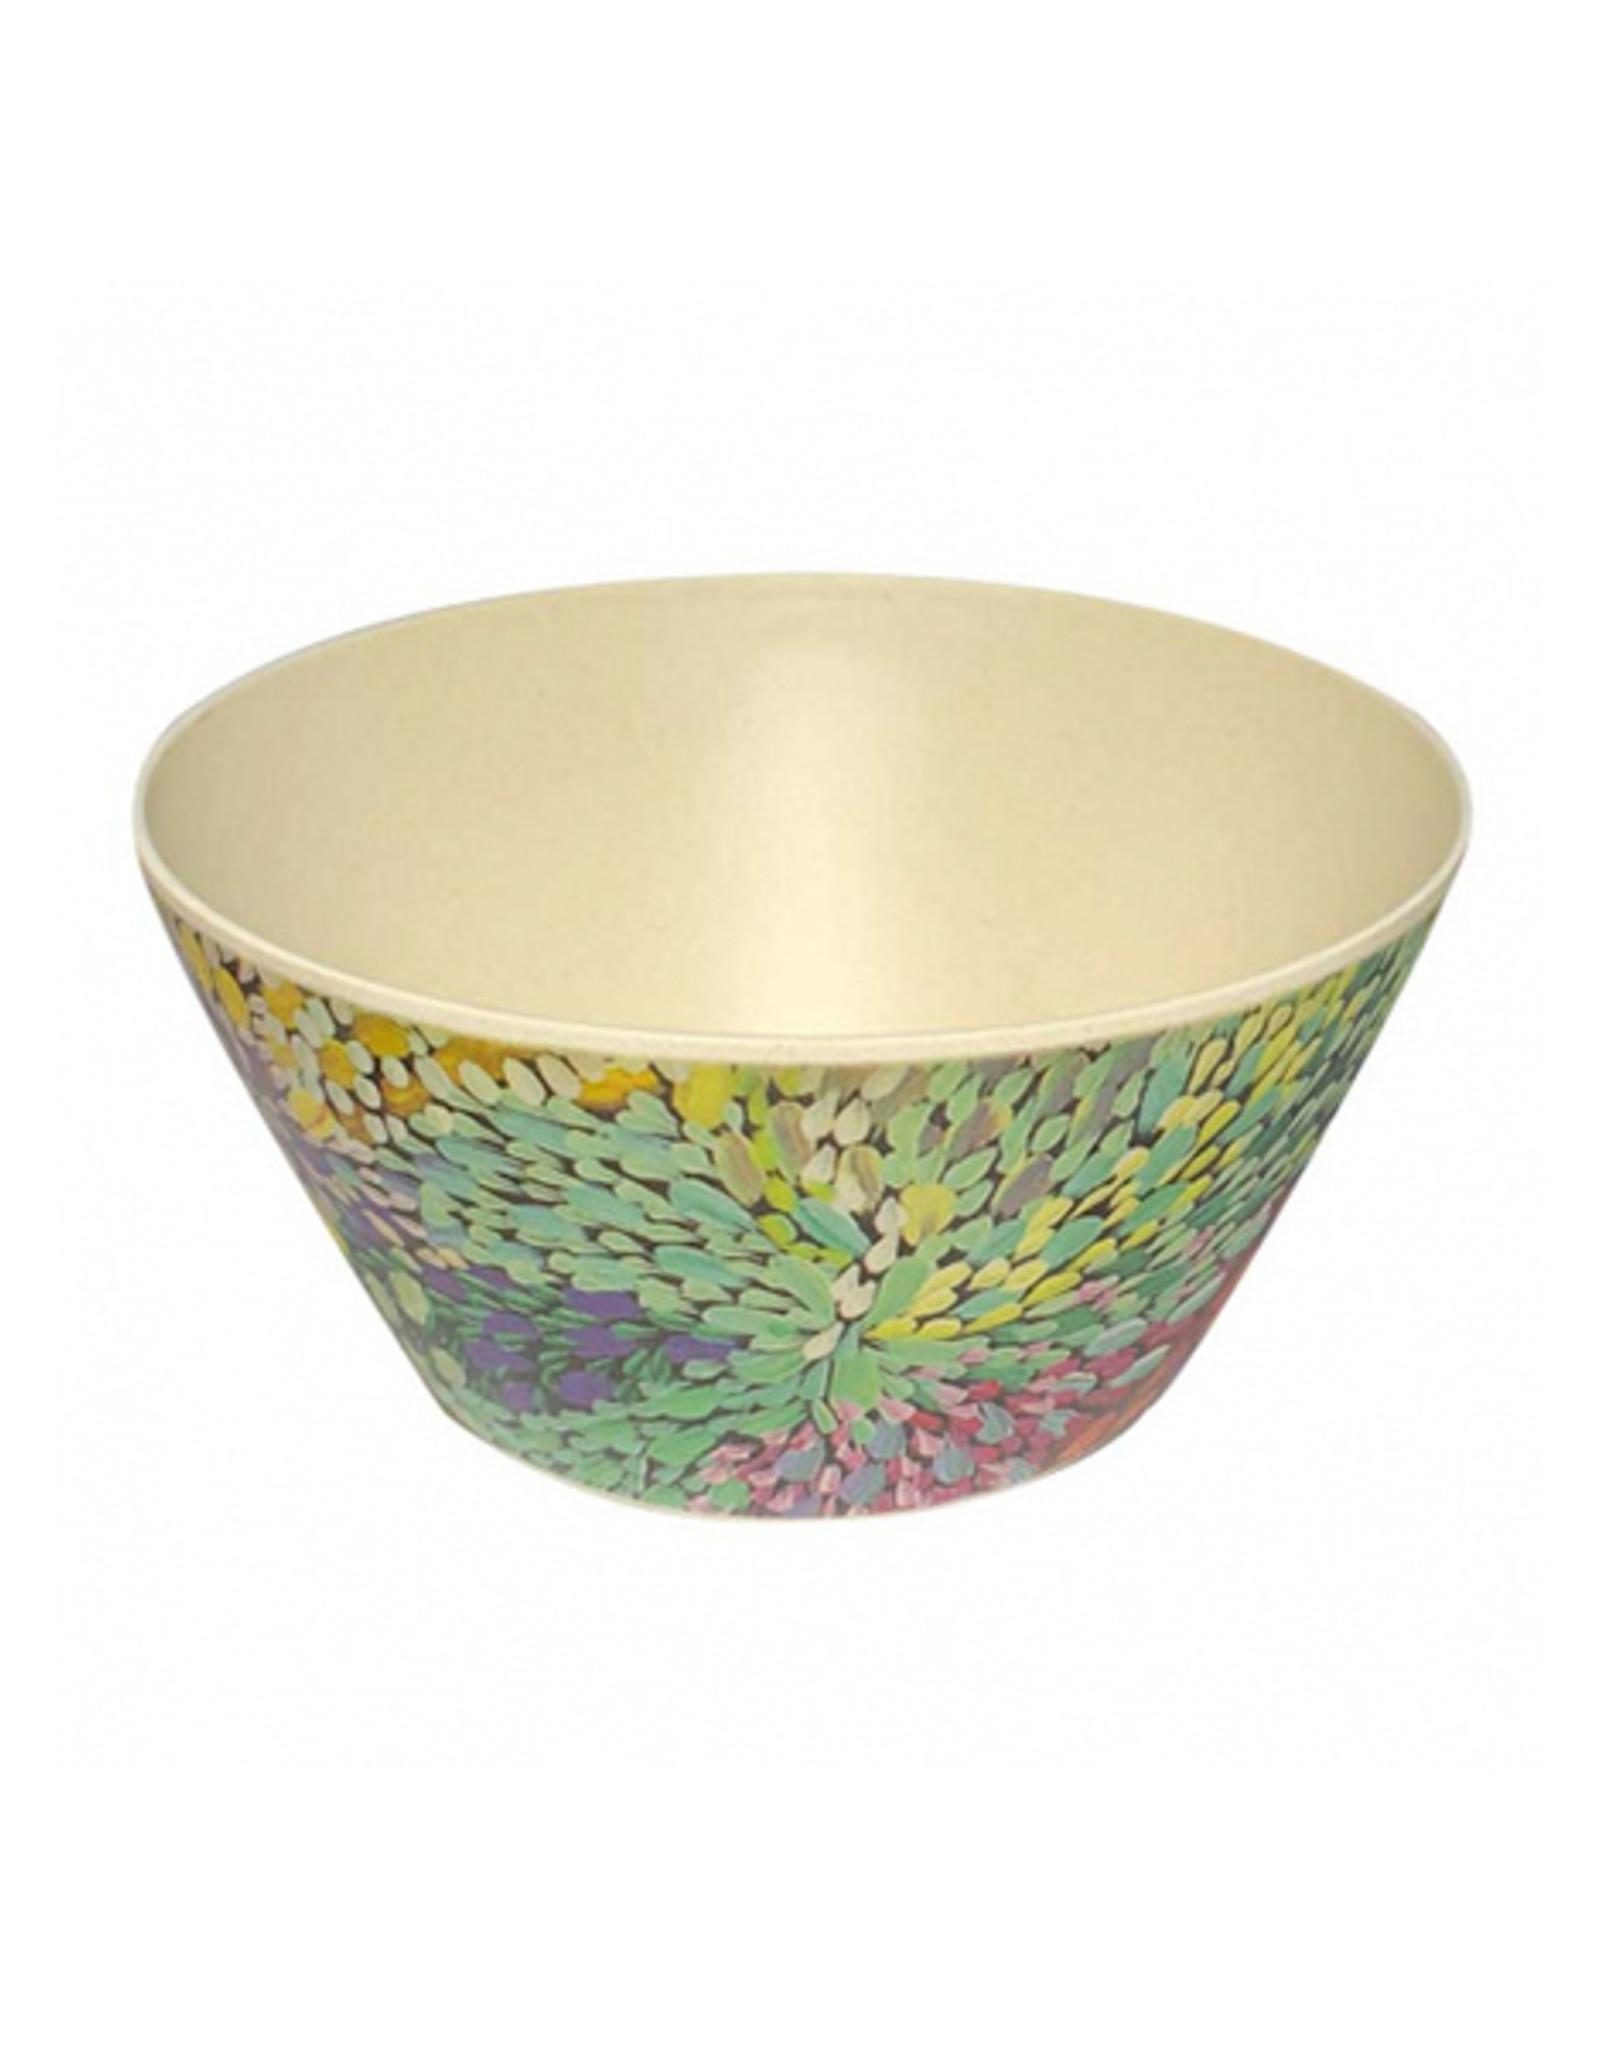 Utopia Bamboo Bowl Small 129 - Janelle Stockman